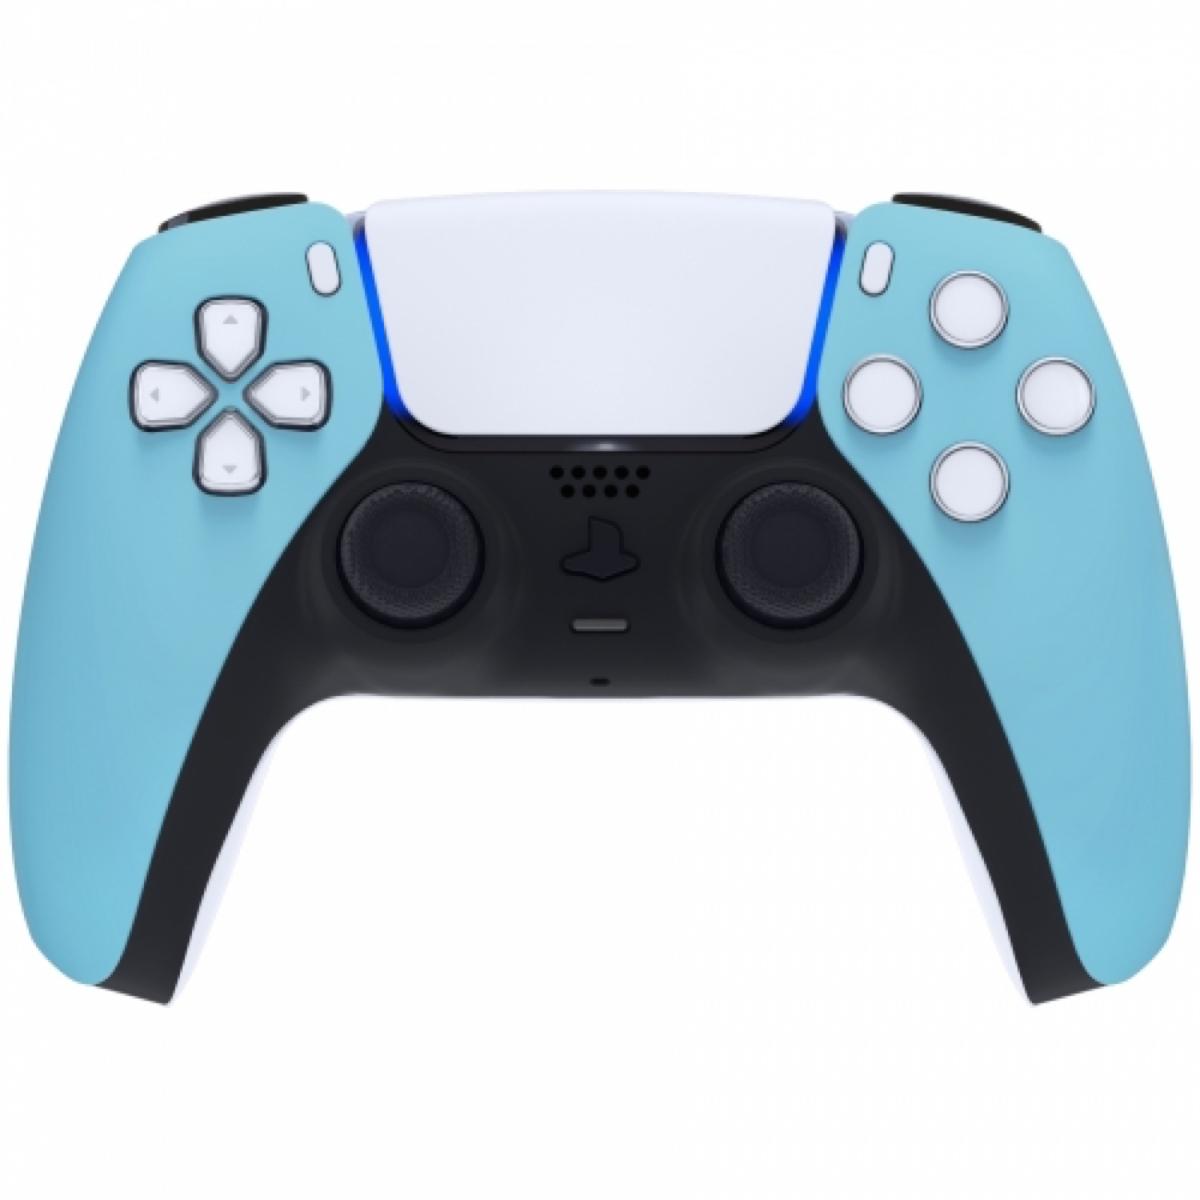 Consoleskins Sony PS5 DualSense Draadloze Controller - Hemelsblauw Soft Touch Front Custom